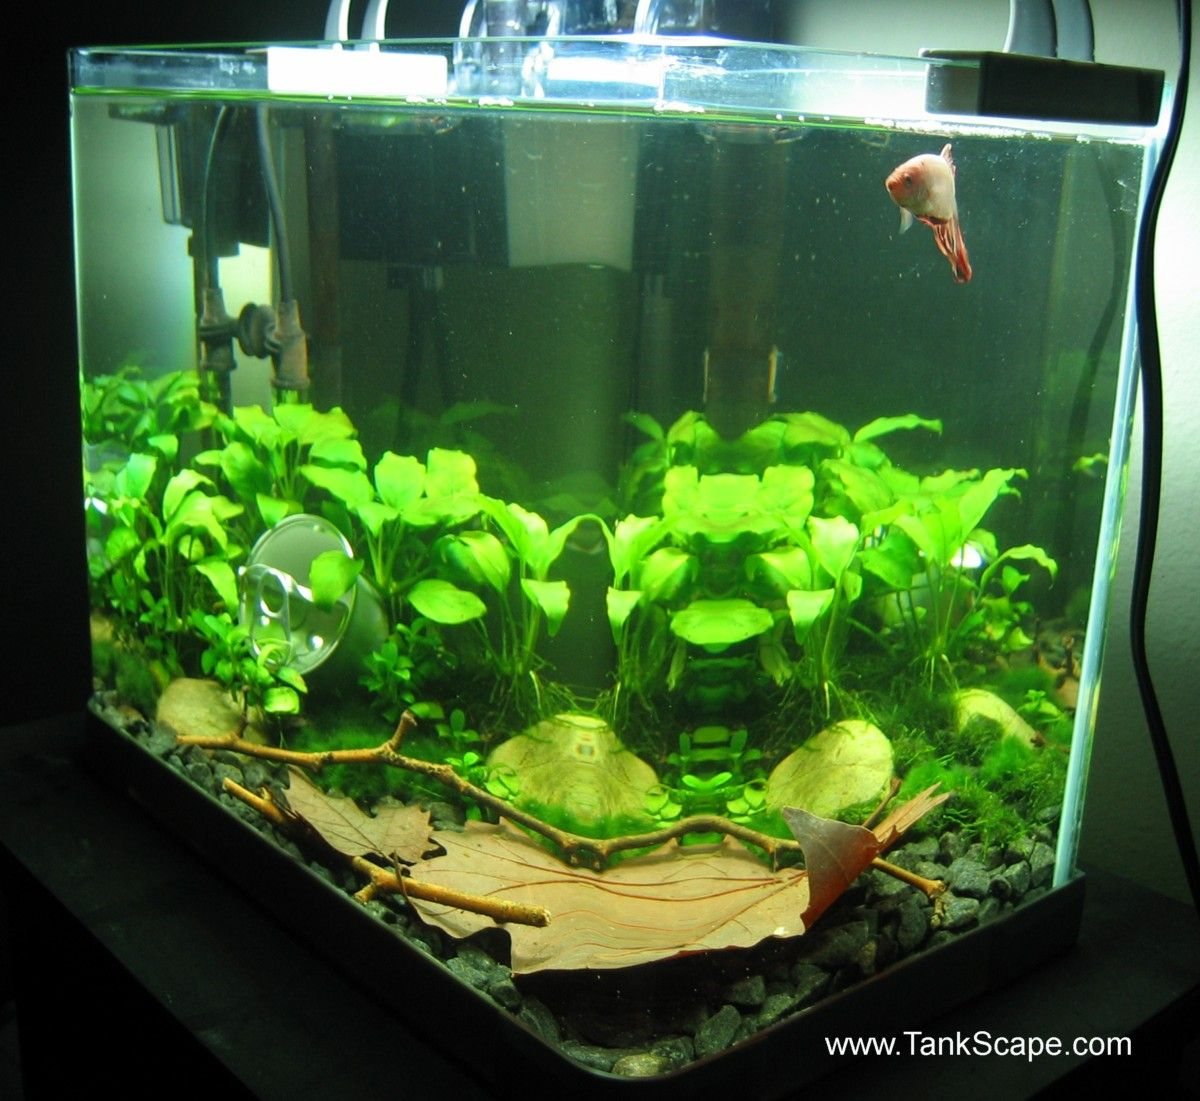 10 Gallon Fish Tank Stand Ideas For Your Aquarium Fish Tank Betta Fish Tank Betta Fish